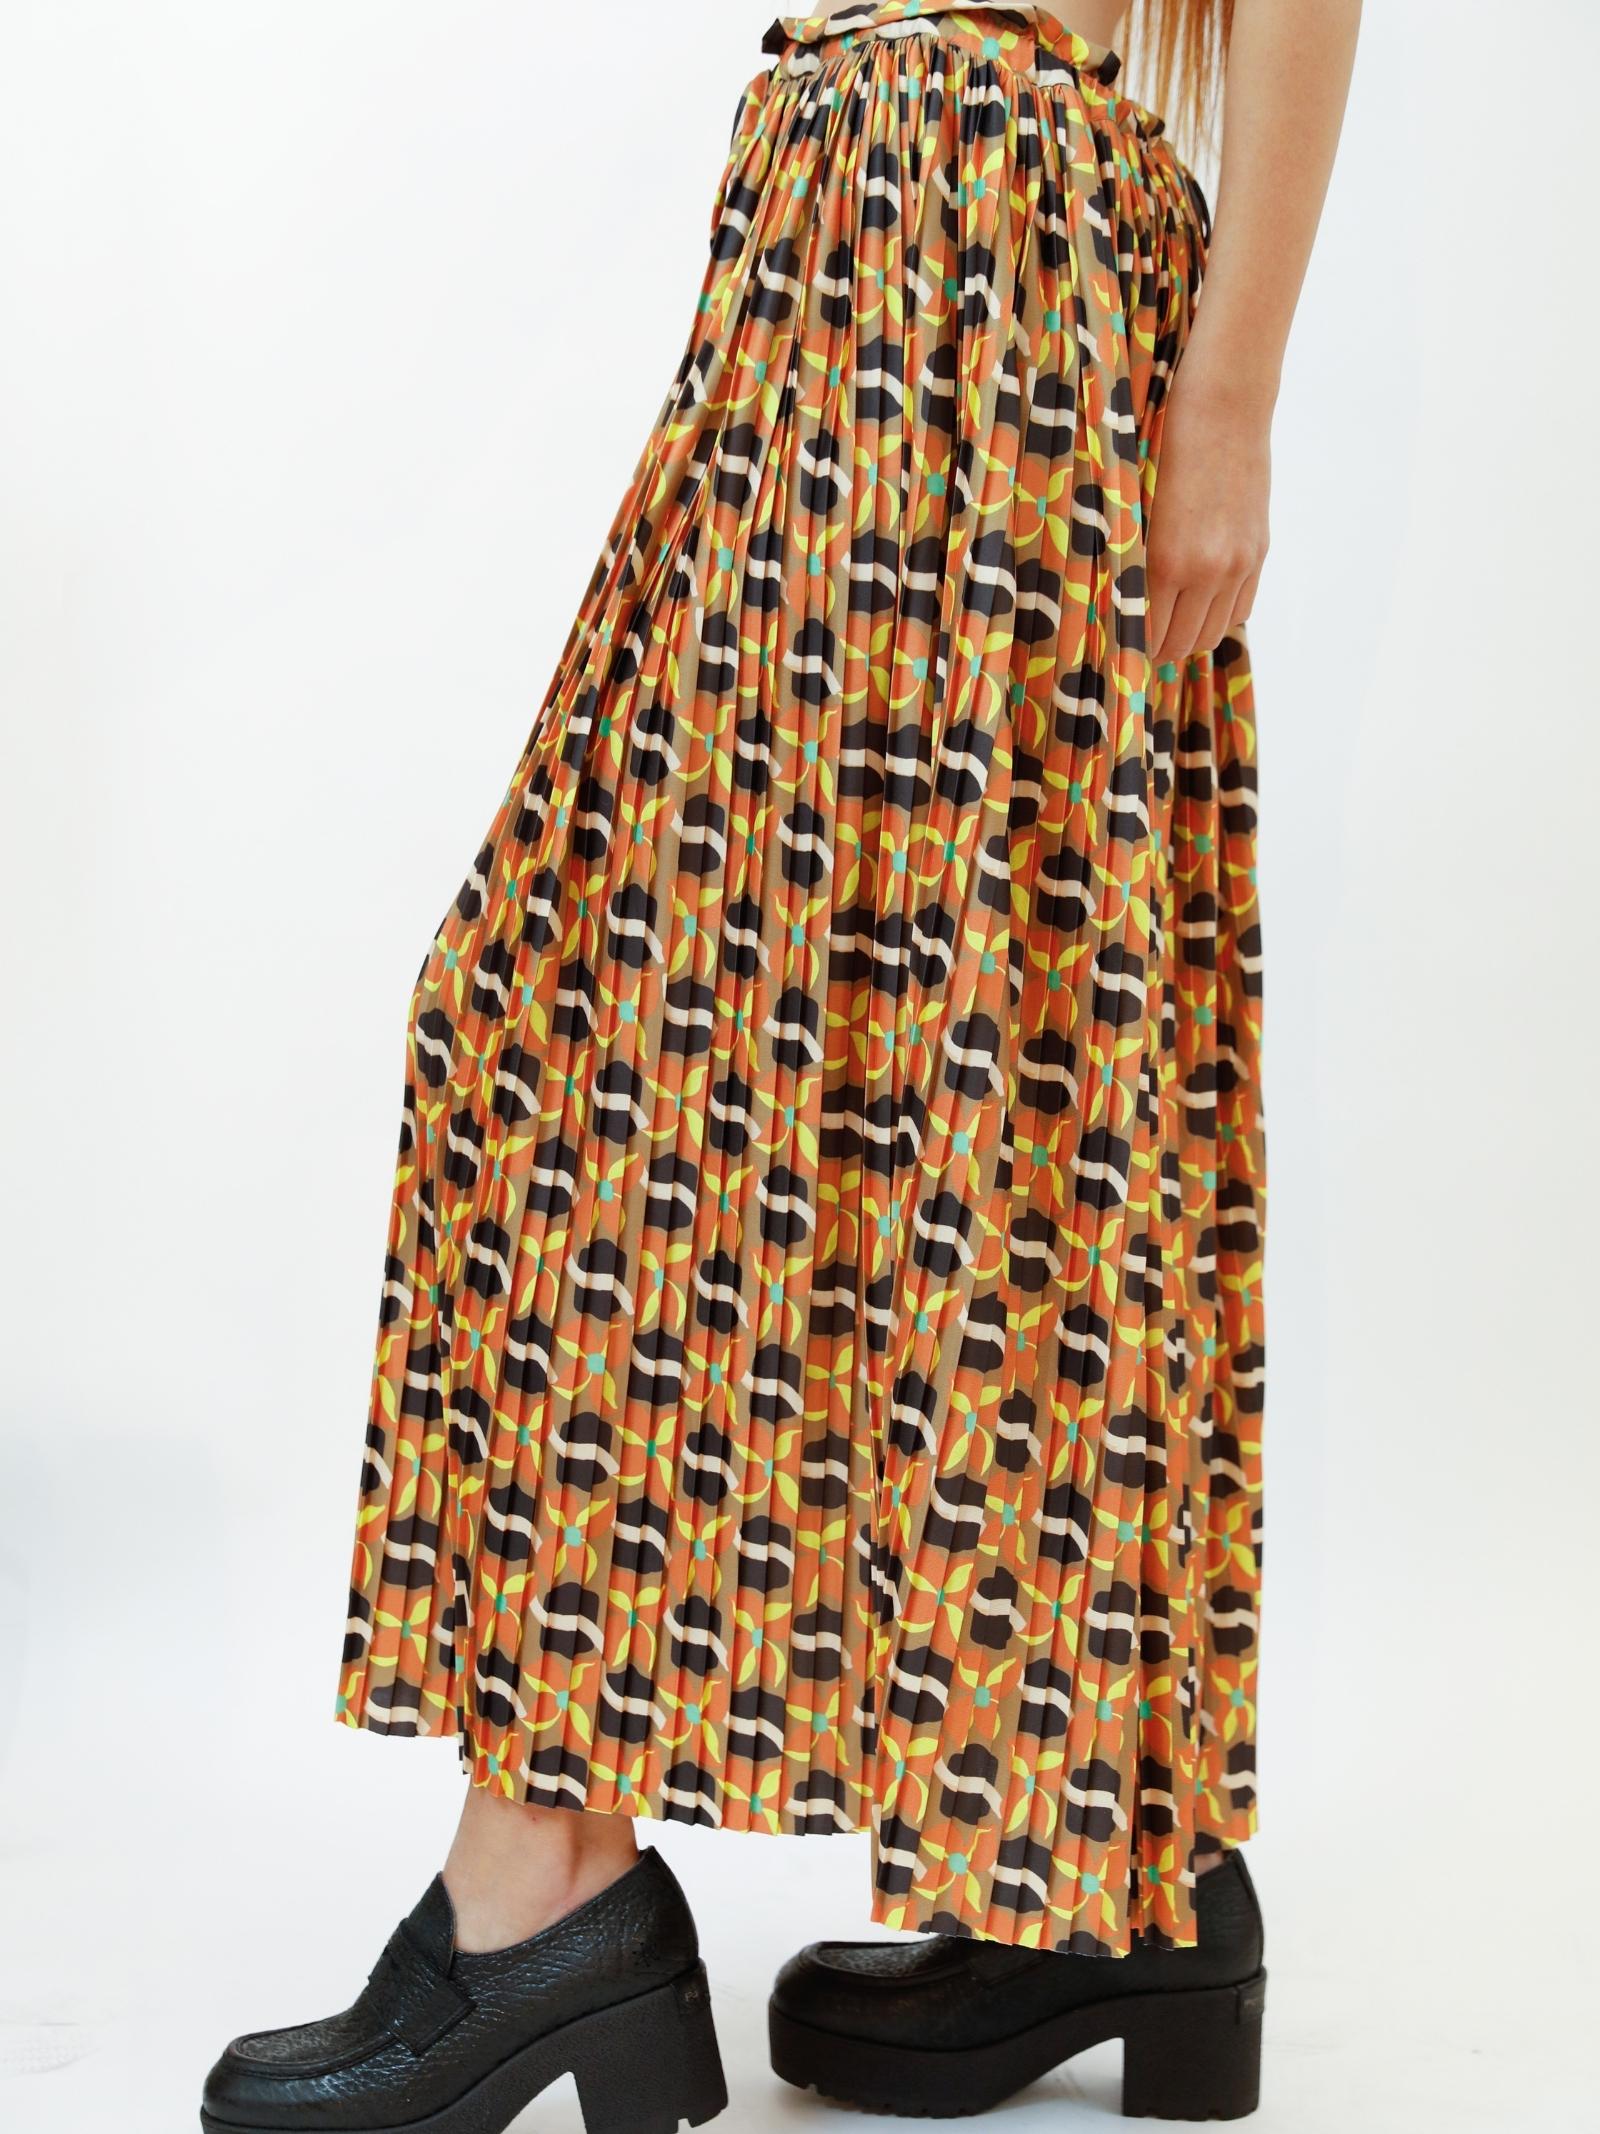 Women's Clothing Skirt Daffod in Printed Jersey Beige Patterned Drawstring Waist Maliparmi   Skirts and Pants   JG362970524B1252